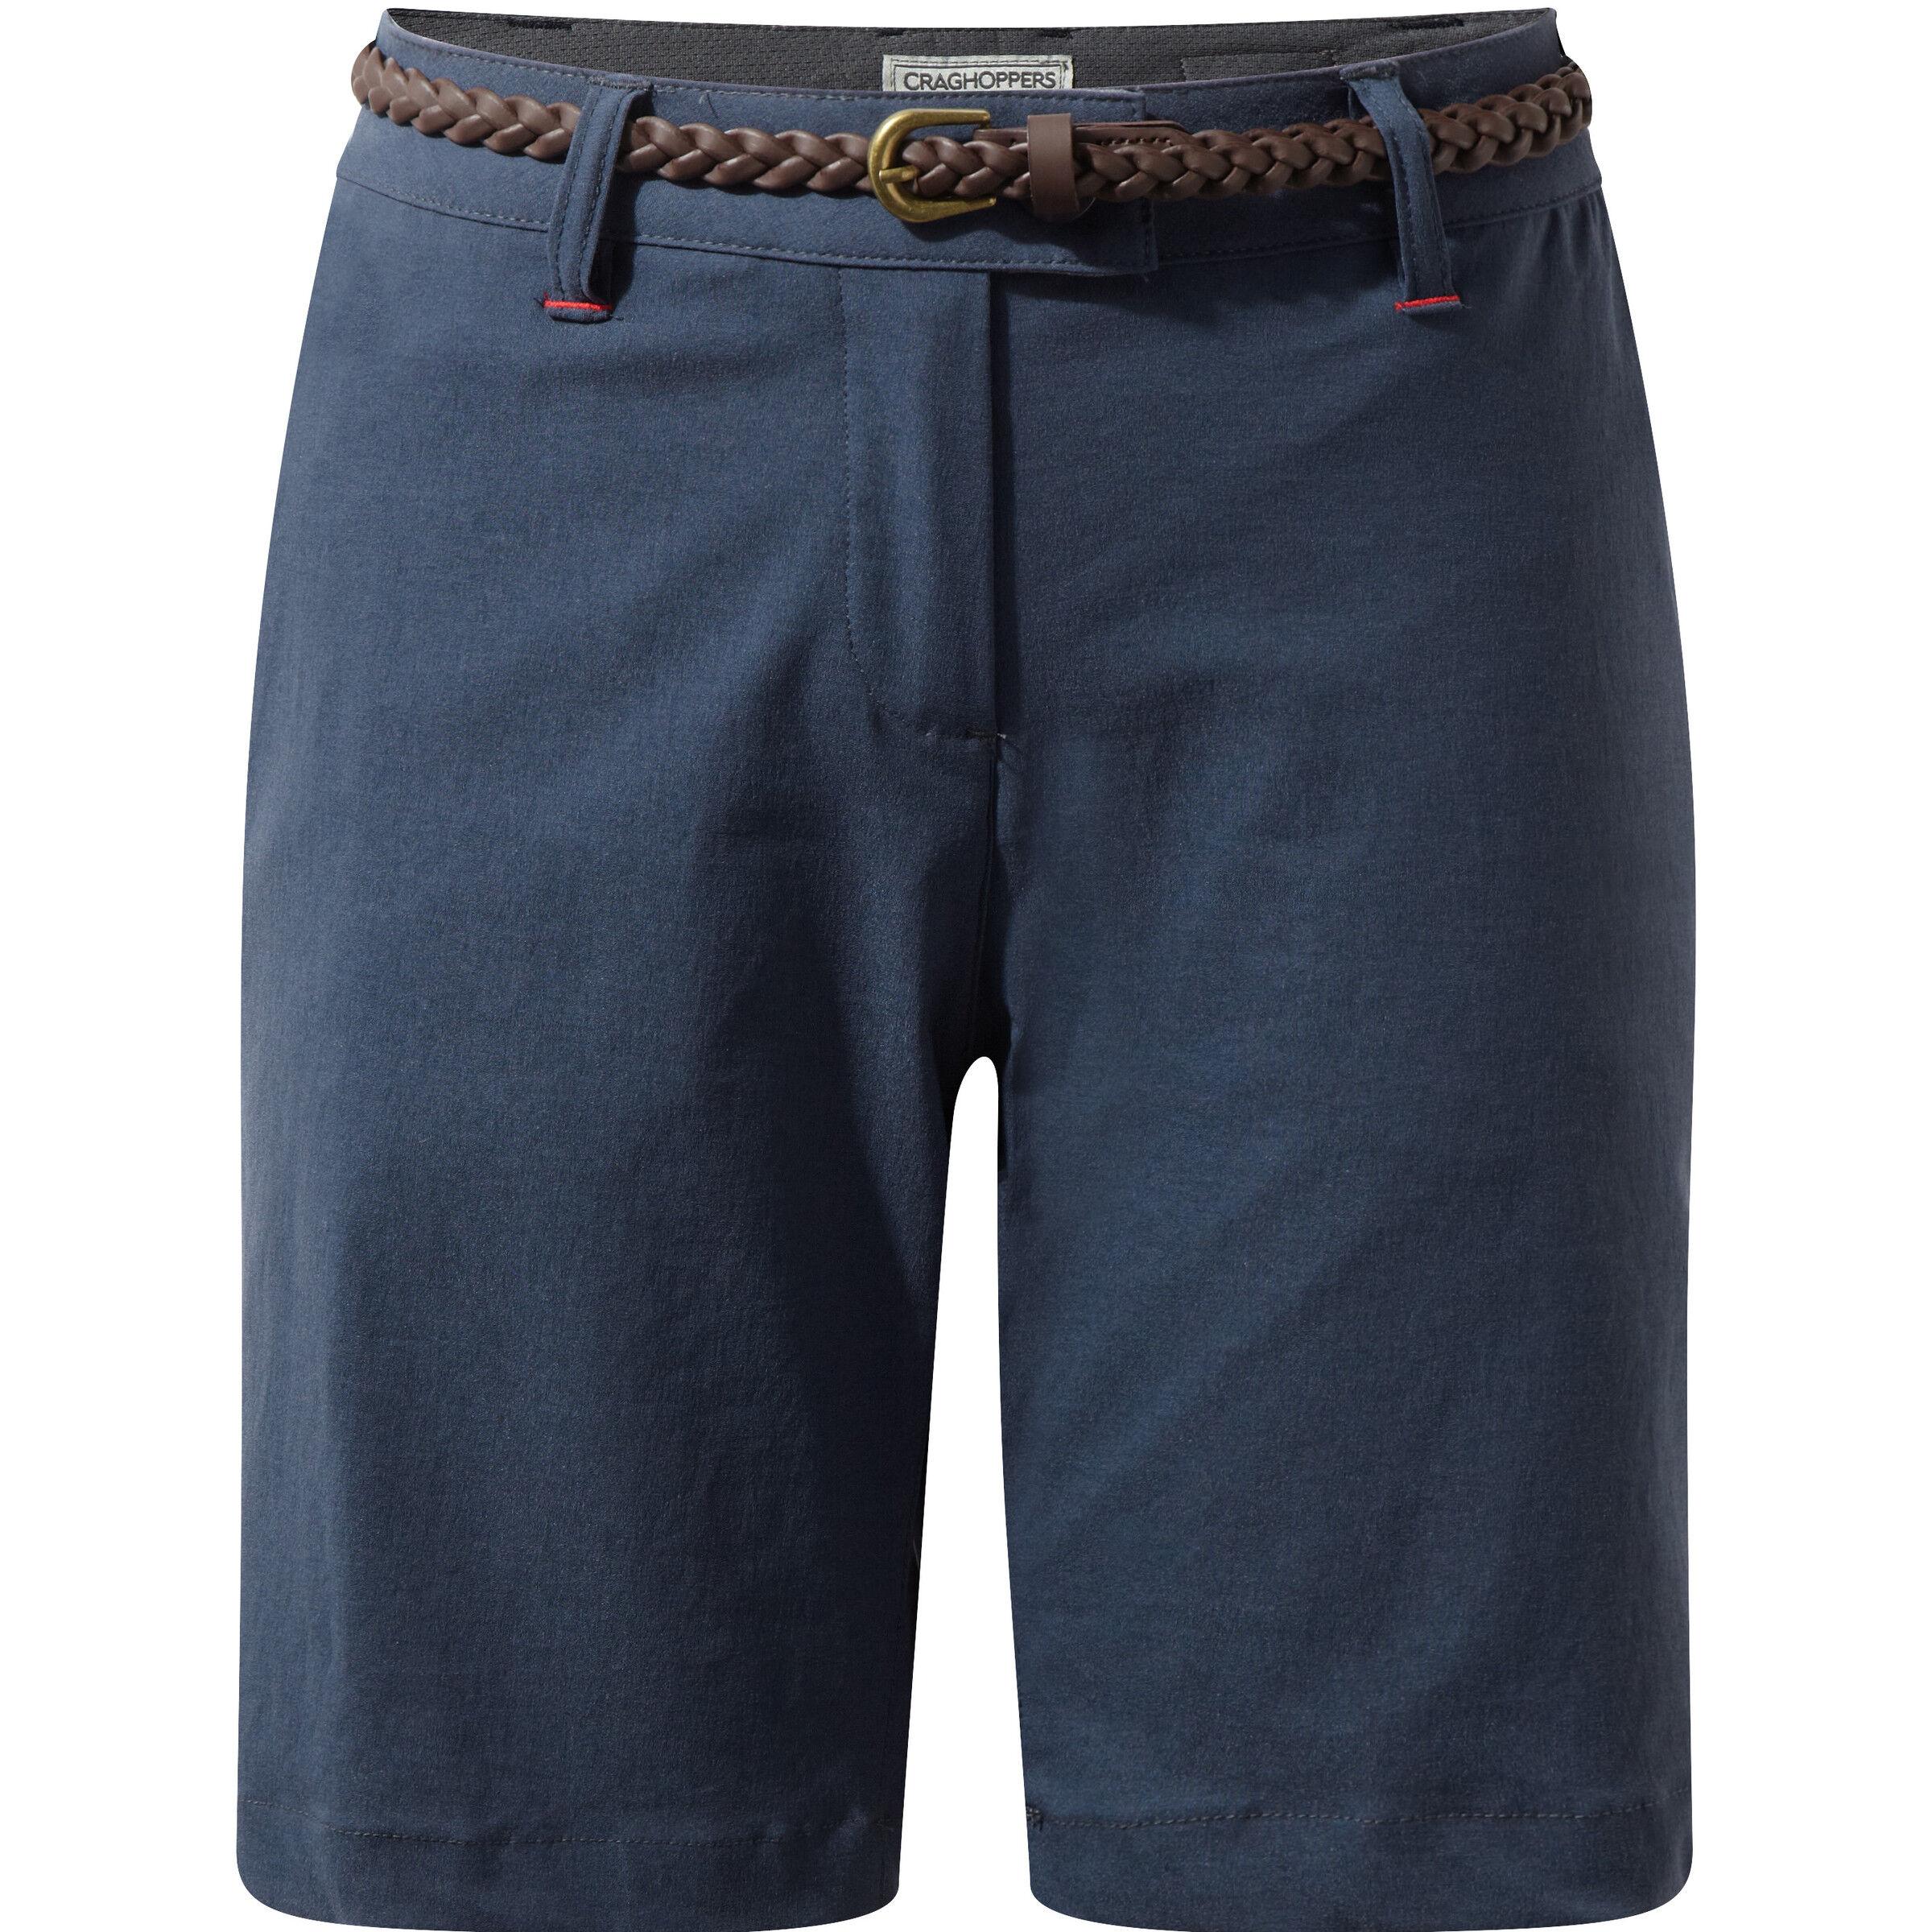 HosenTrekking Kurze Herren Kurze HosenTrekking Damenamp; Shorts Shorts Herren Kurze Damenamp; VSqpGzMU